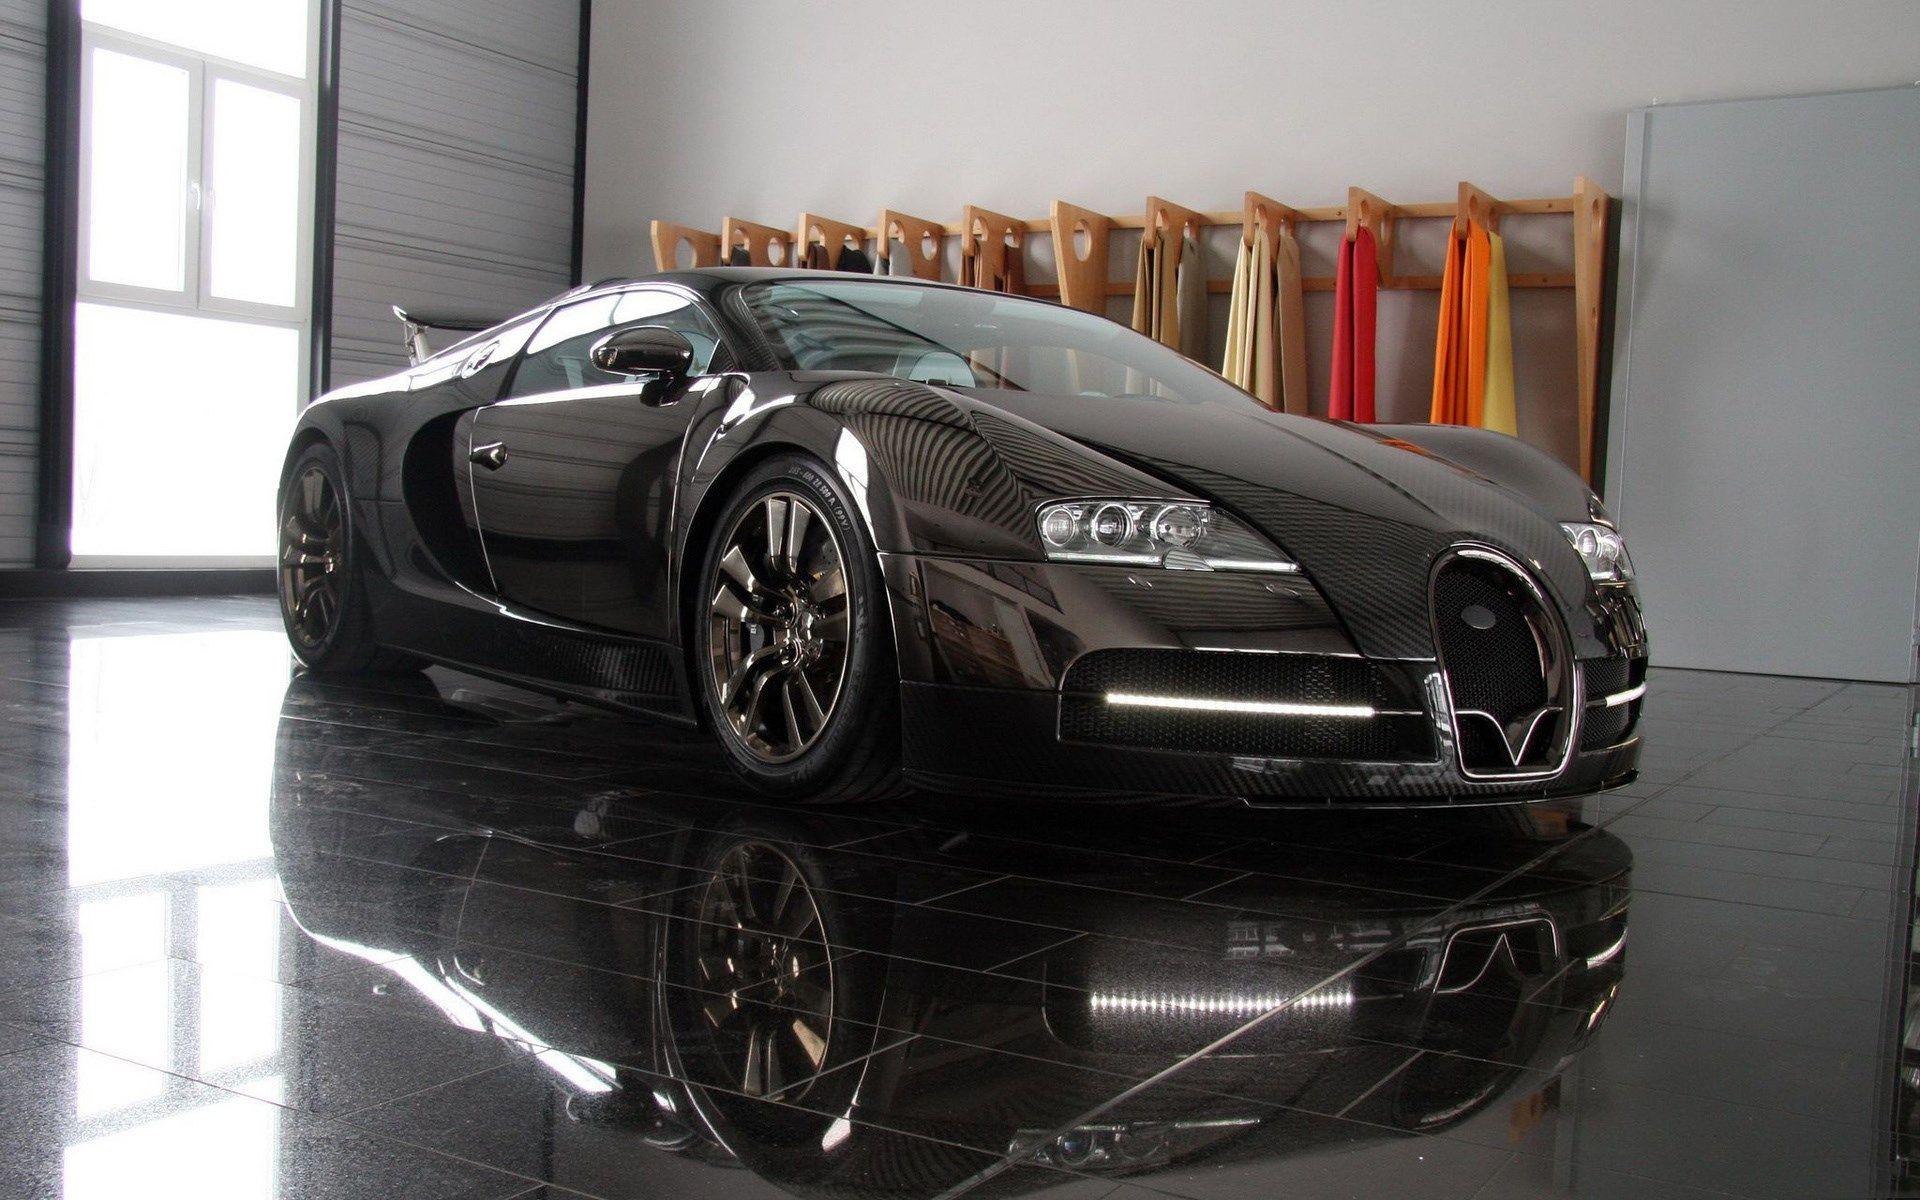 Free Screensaver Wallpapers For Bugatti 1920x1200 398 Kb Bugatti Cars Cars Bugatti Veyron Sports Cars Bugatti